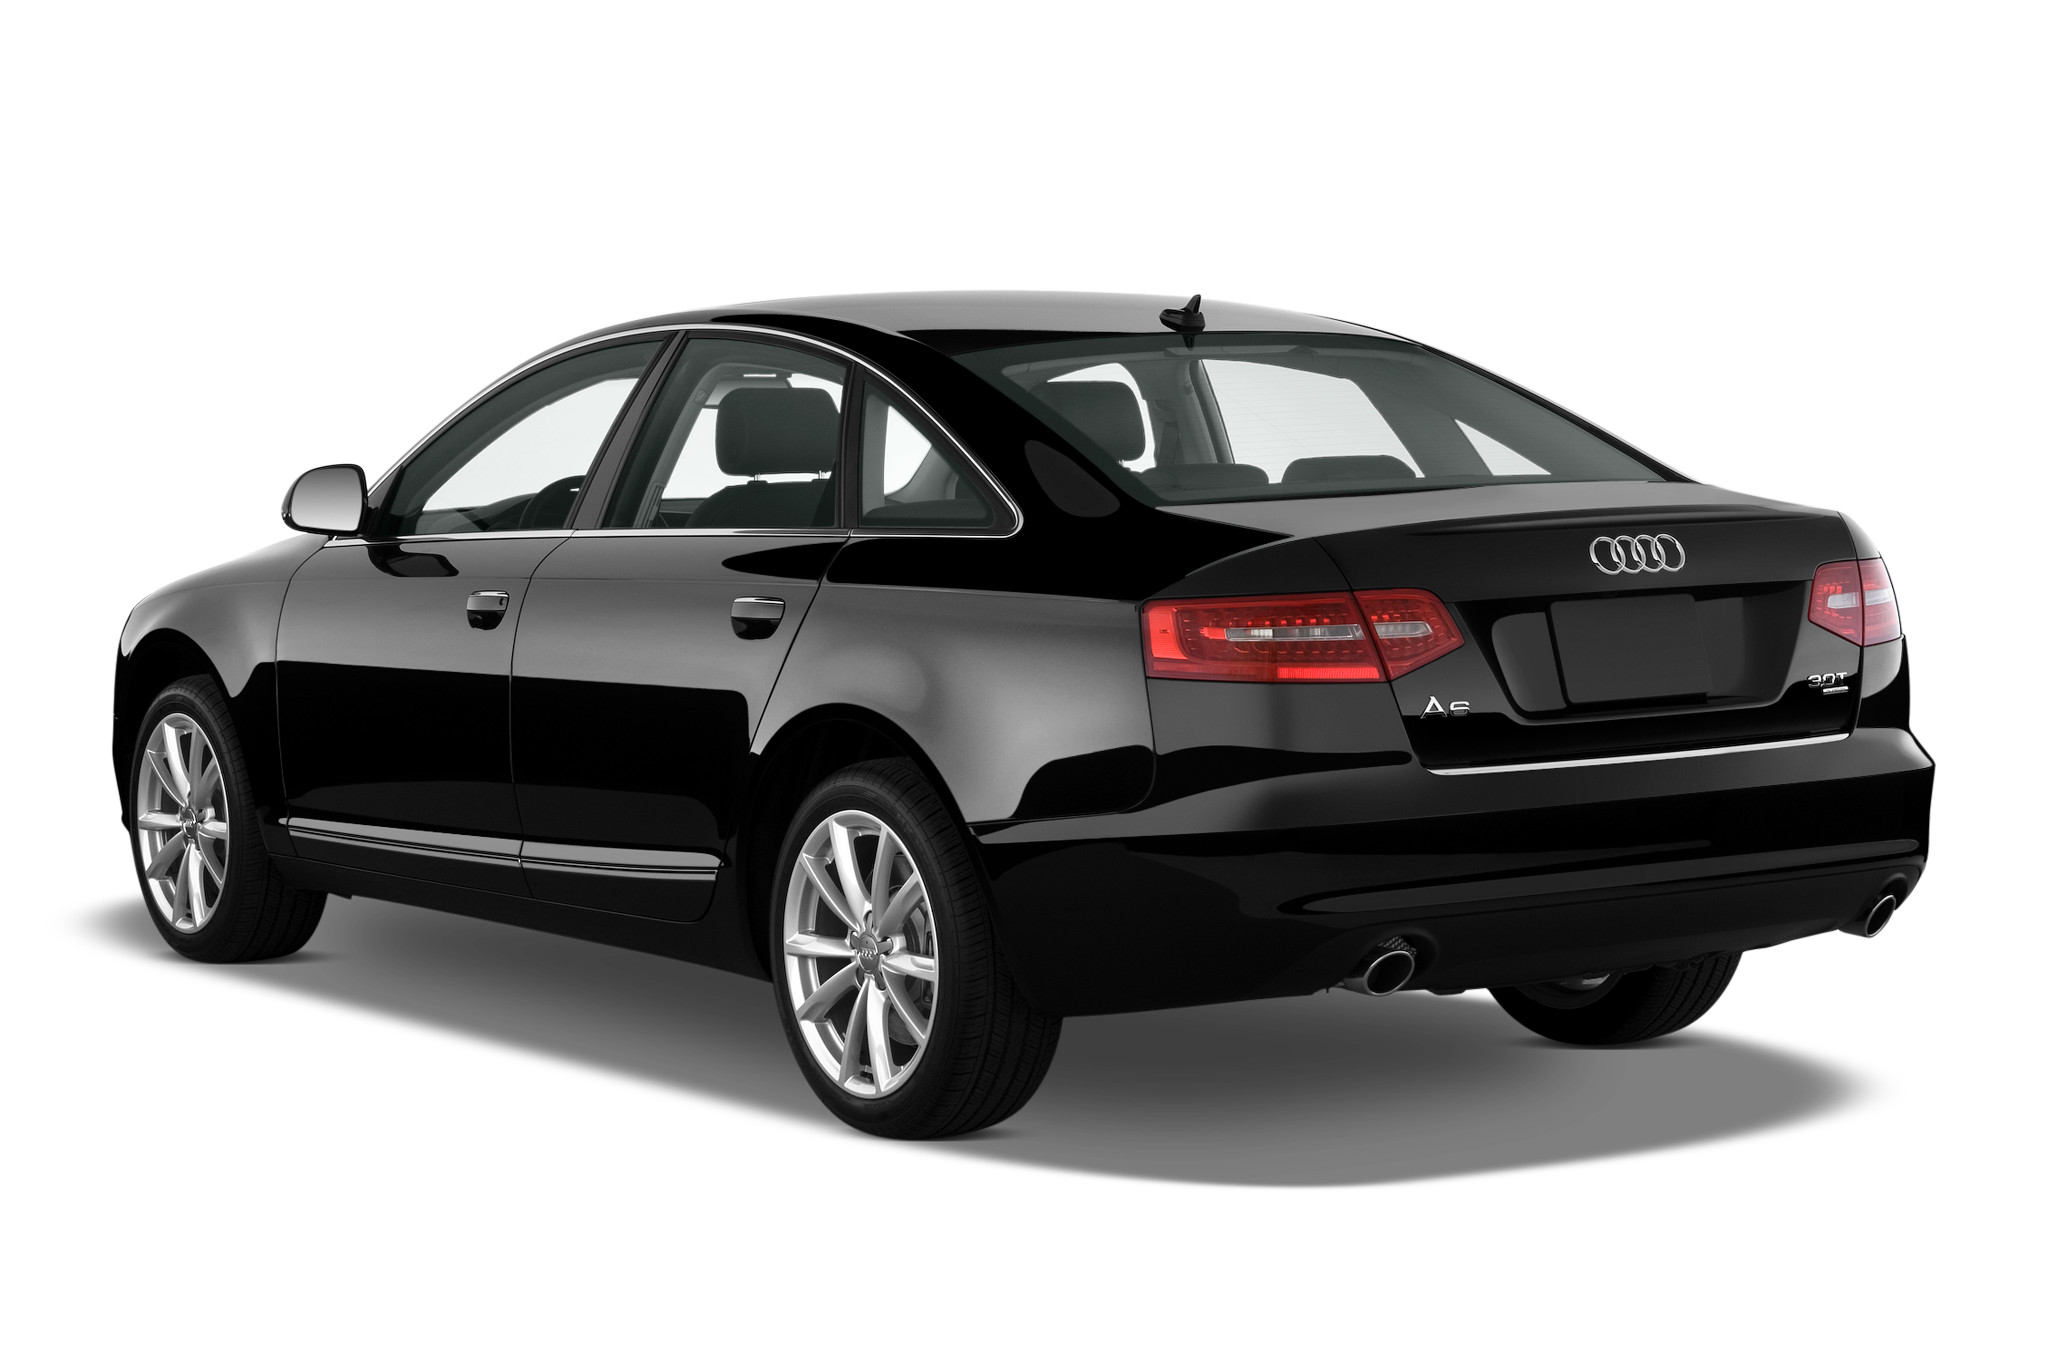 2010 audi a6 3 0 tfsi quattro audi luxury sedan review automobile magazine. Black Bedroom Furniture Sets. Home Design Ideas